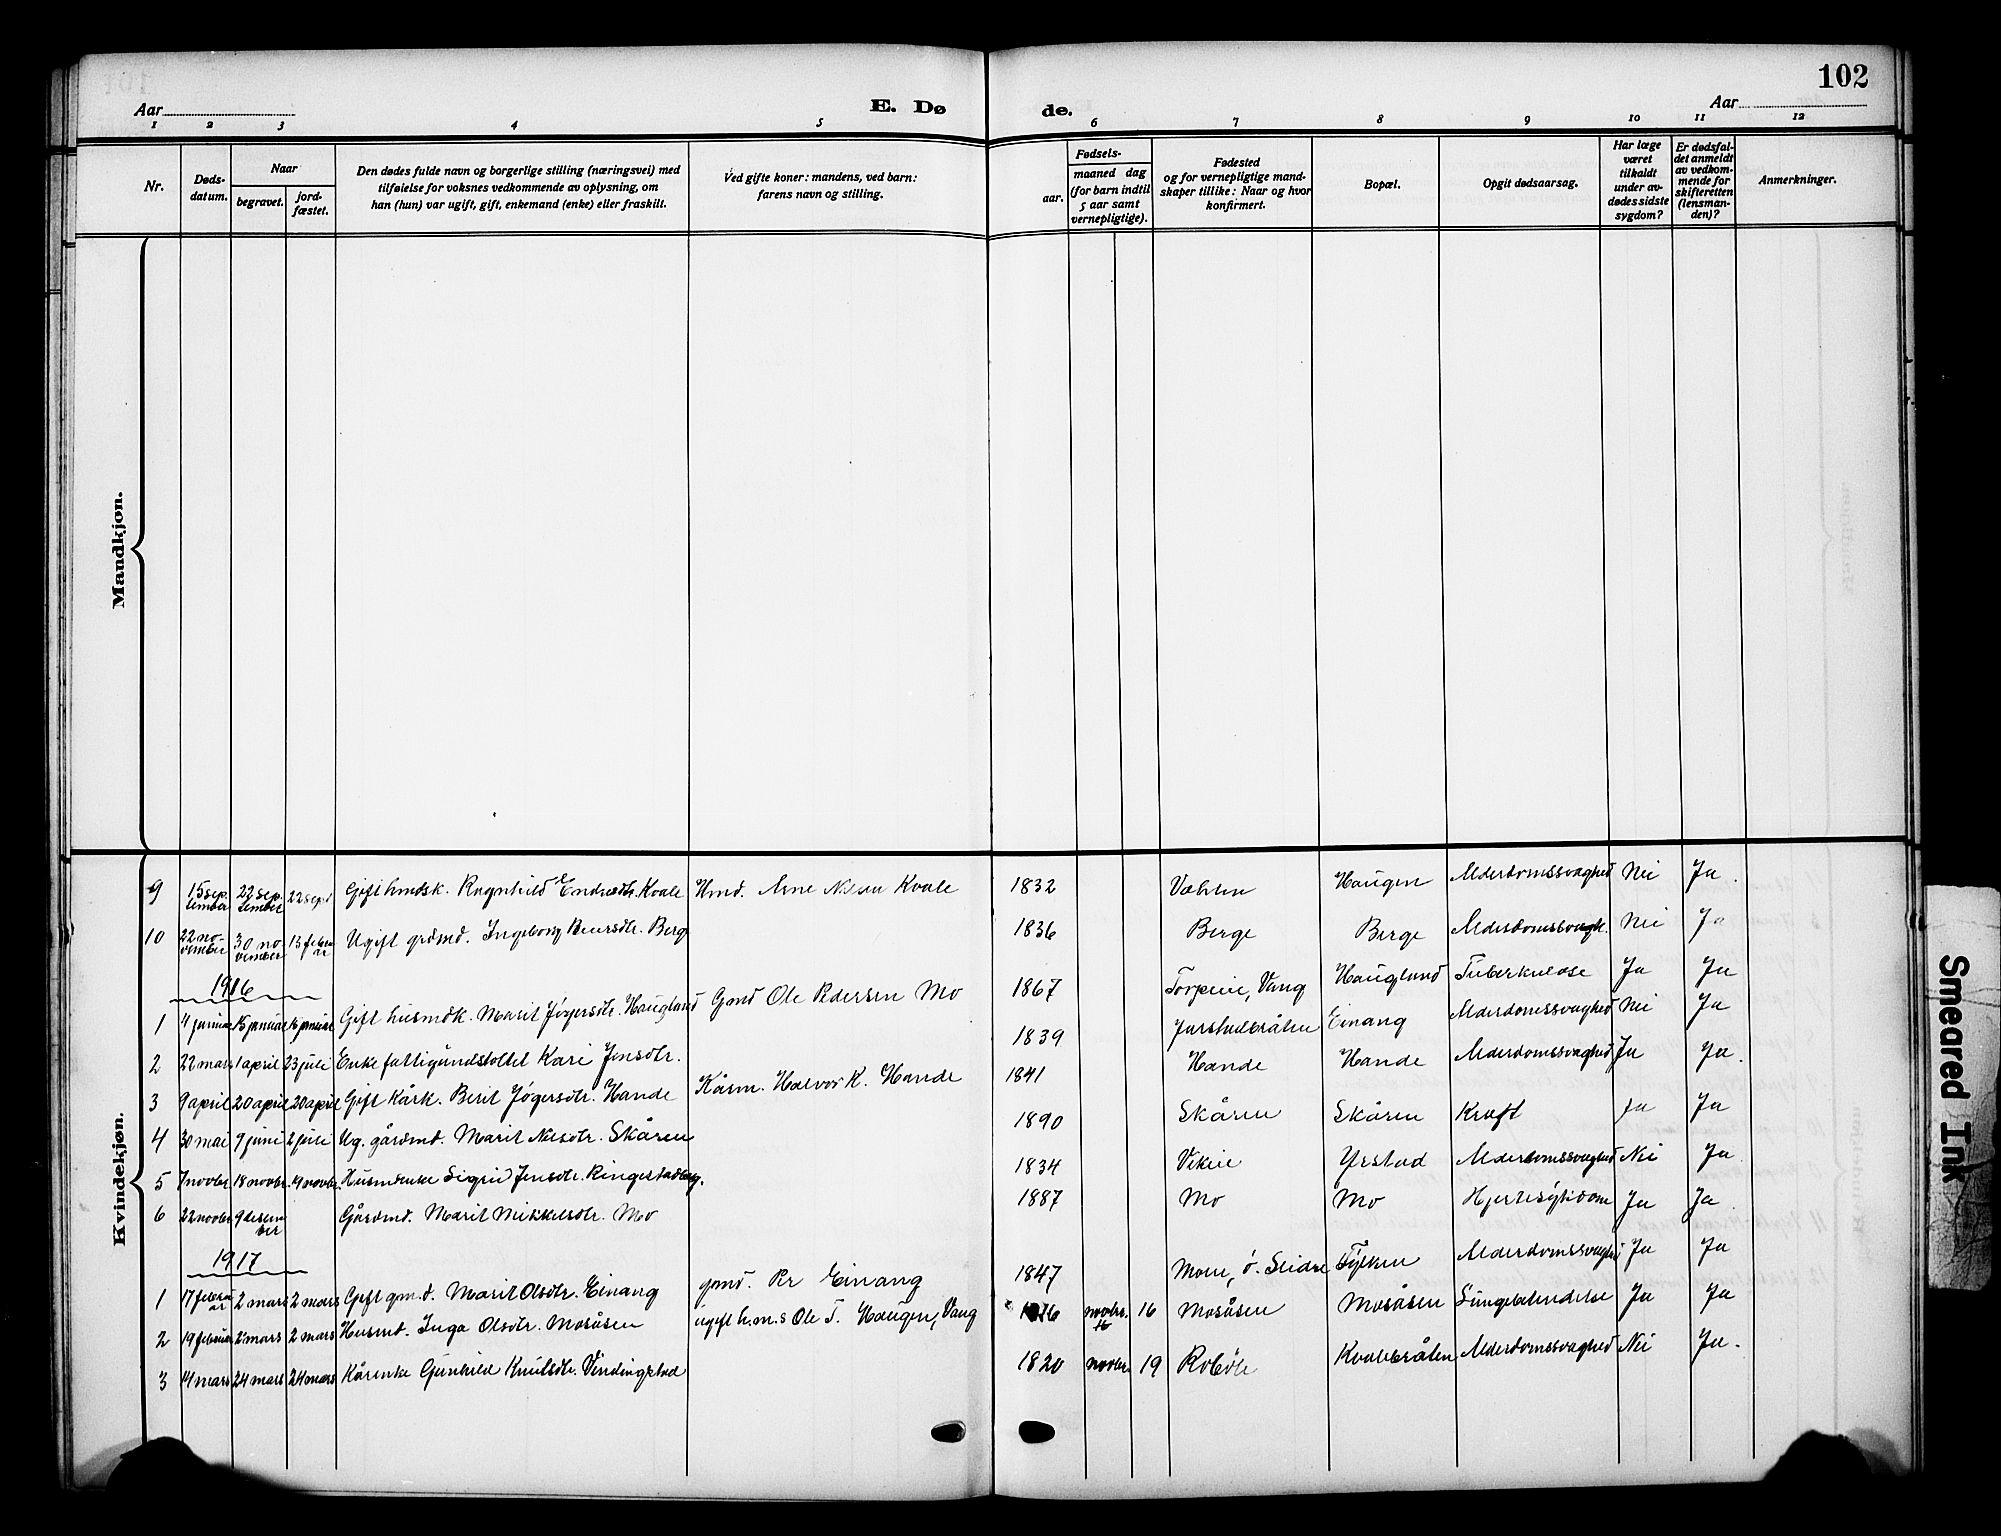 SAH, Vestre Slidre prestekontor, Klokkerbok nr. 7, 1909-1930, s. 102